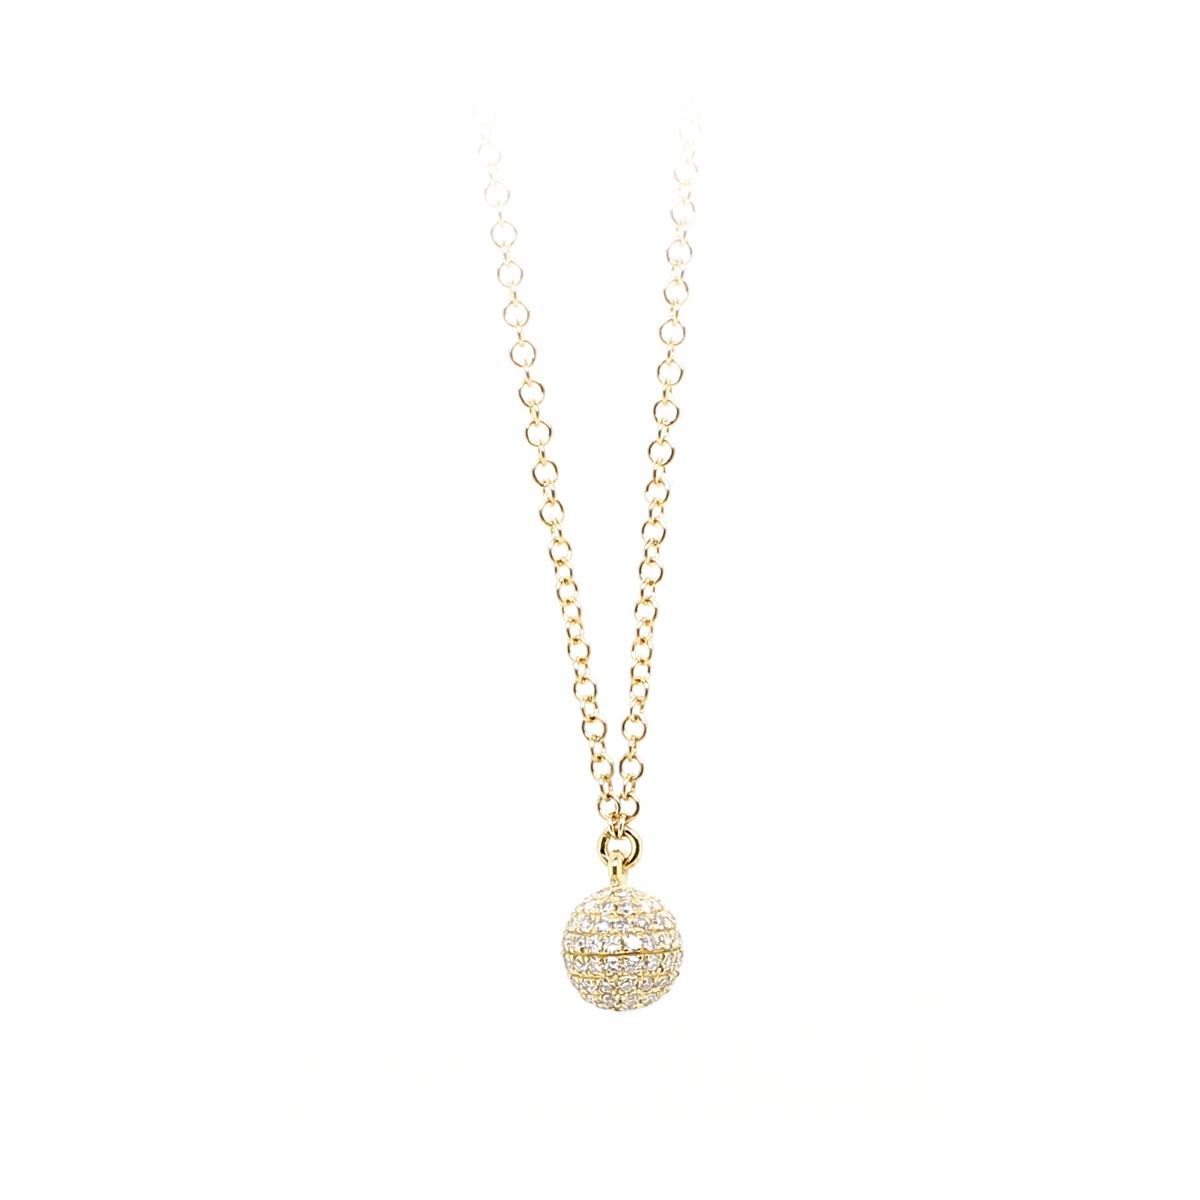 14 Karat Yellow Gold Diamond Ball Necklace